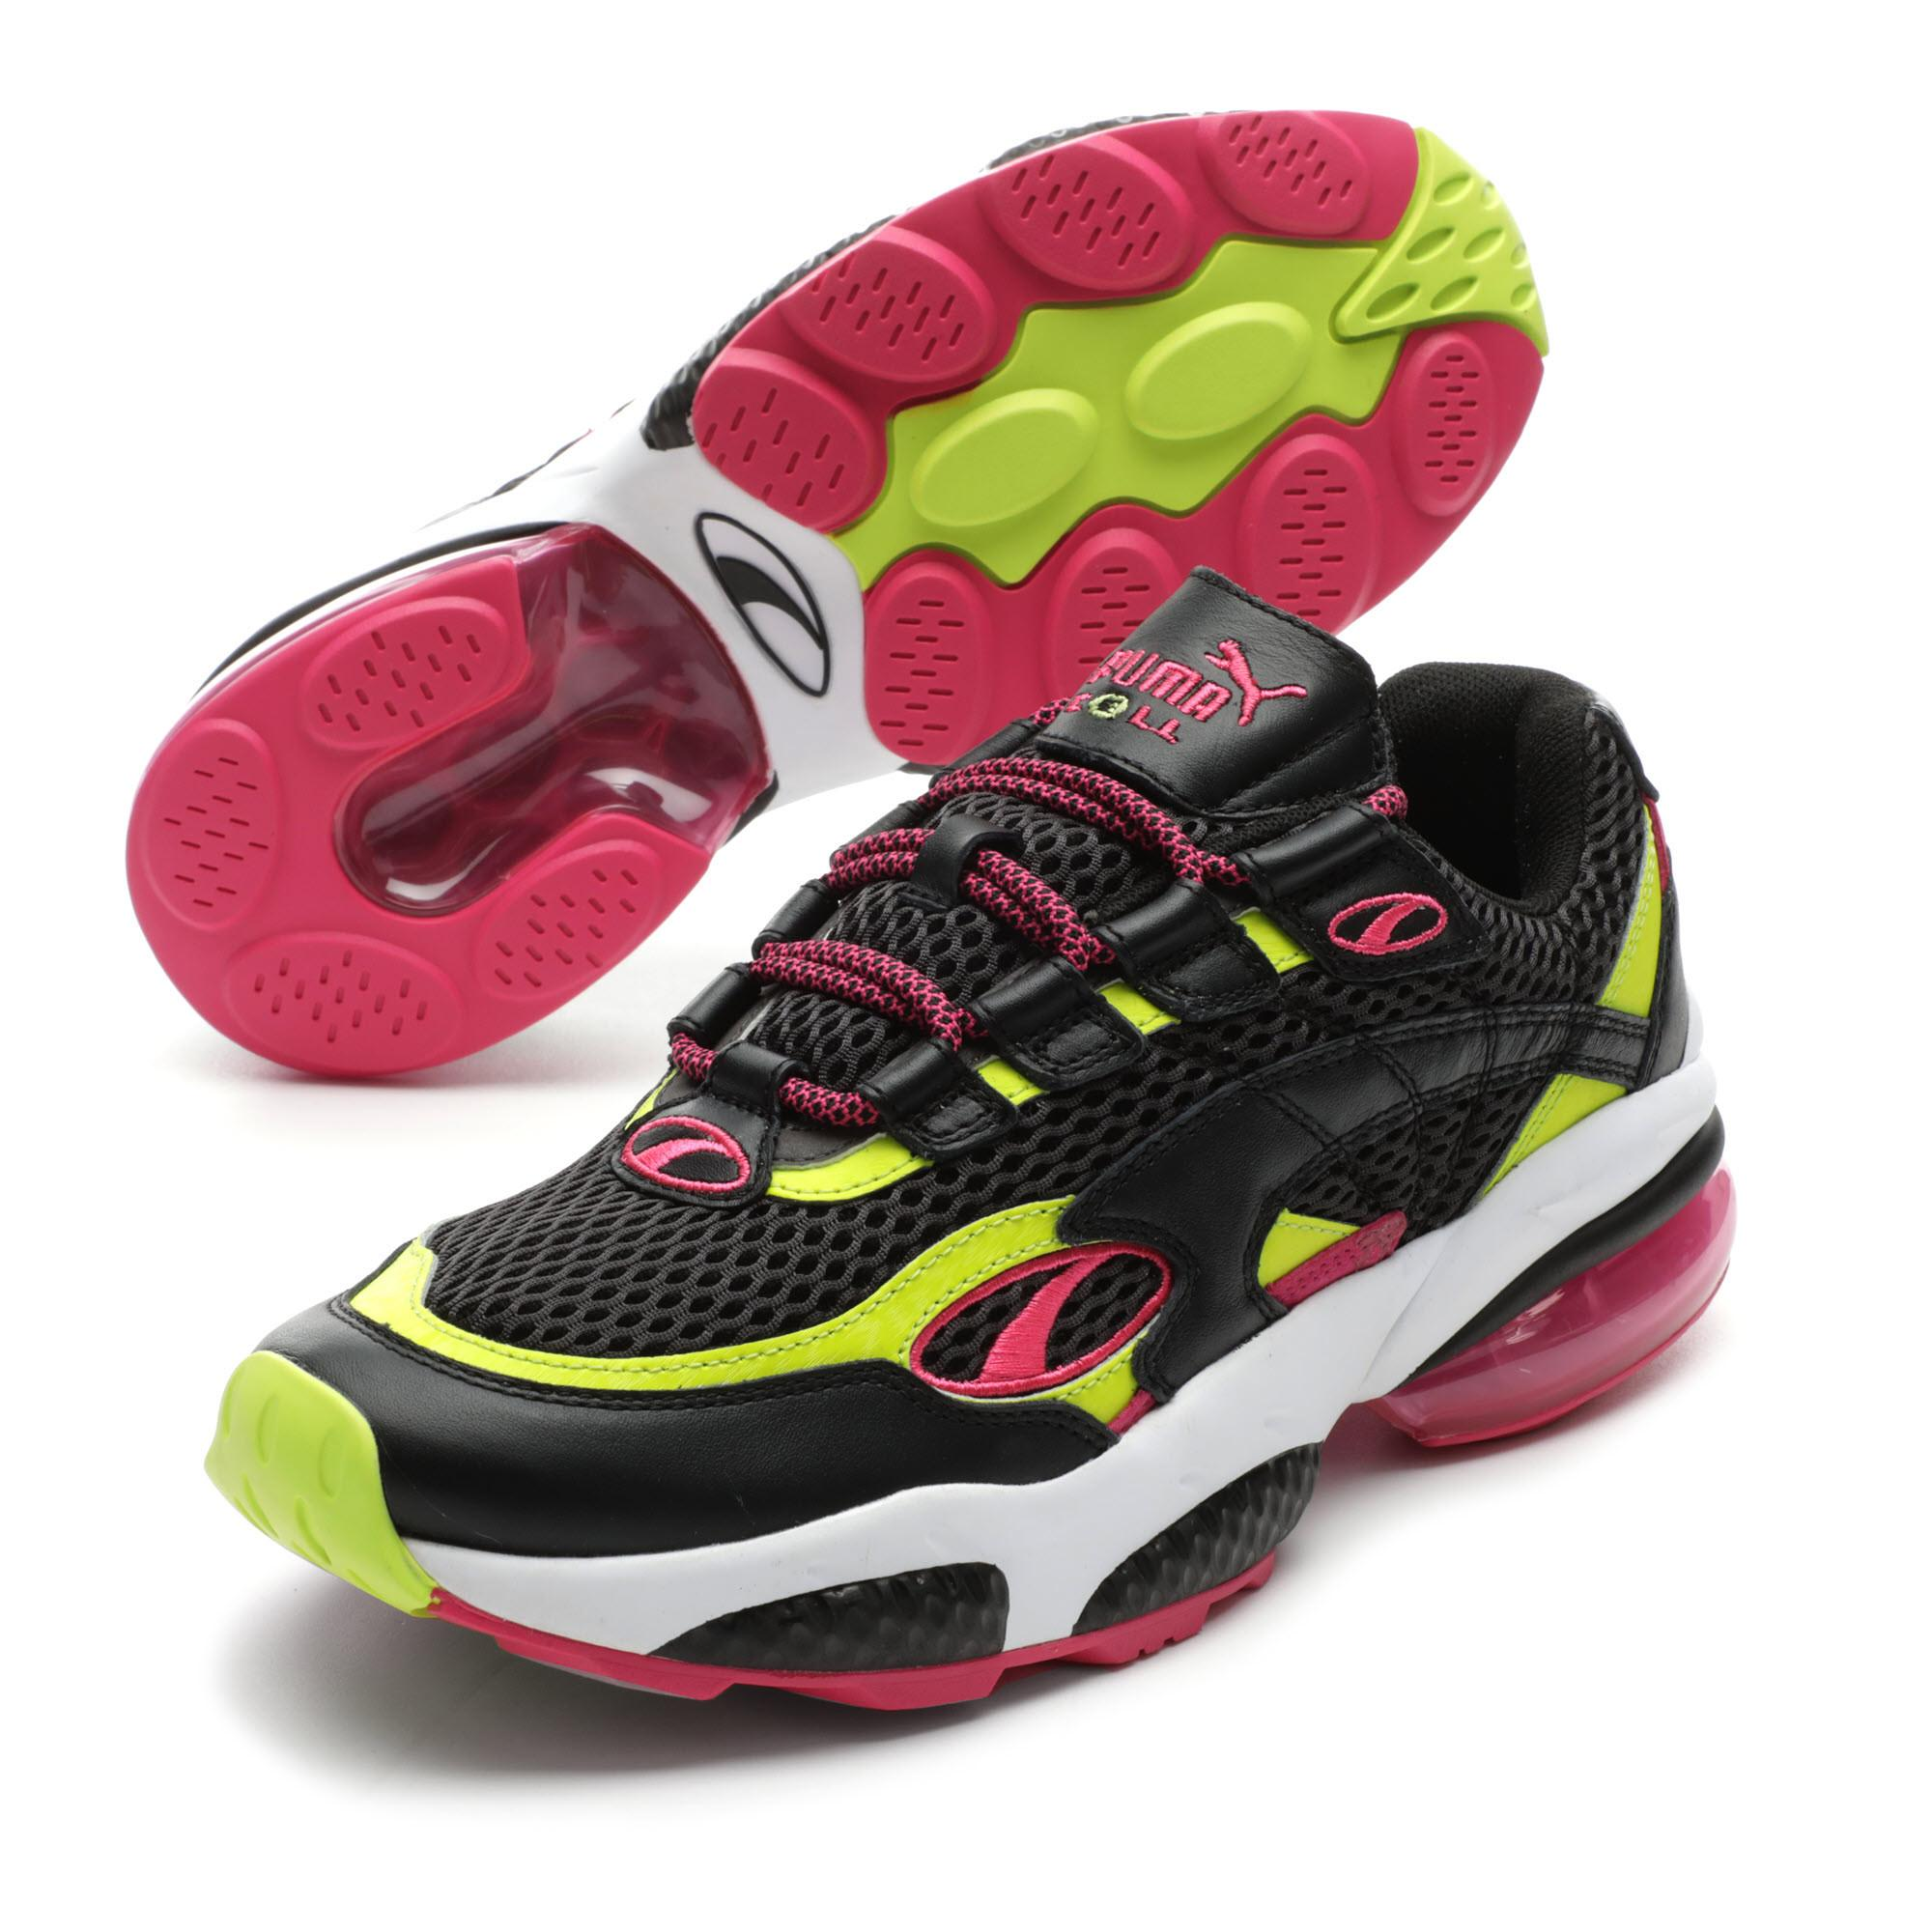 44e9e3aae43a Lyst - PUMA Cell Venom Fresh Mix Women s Sneakers